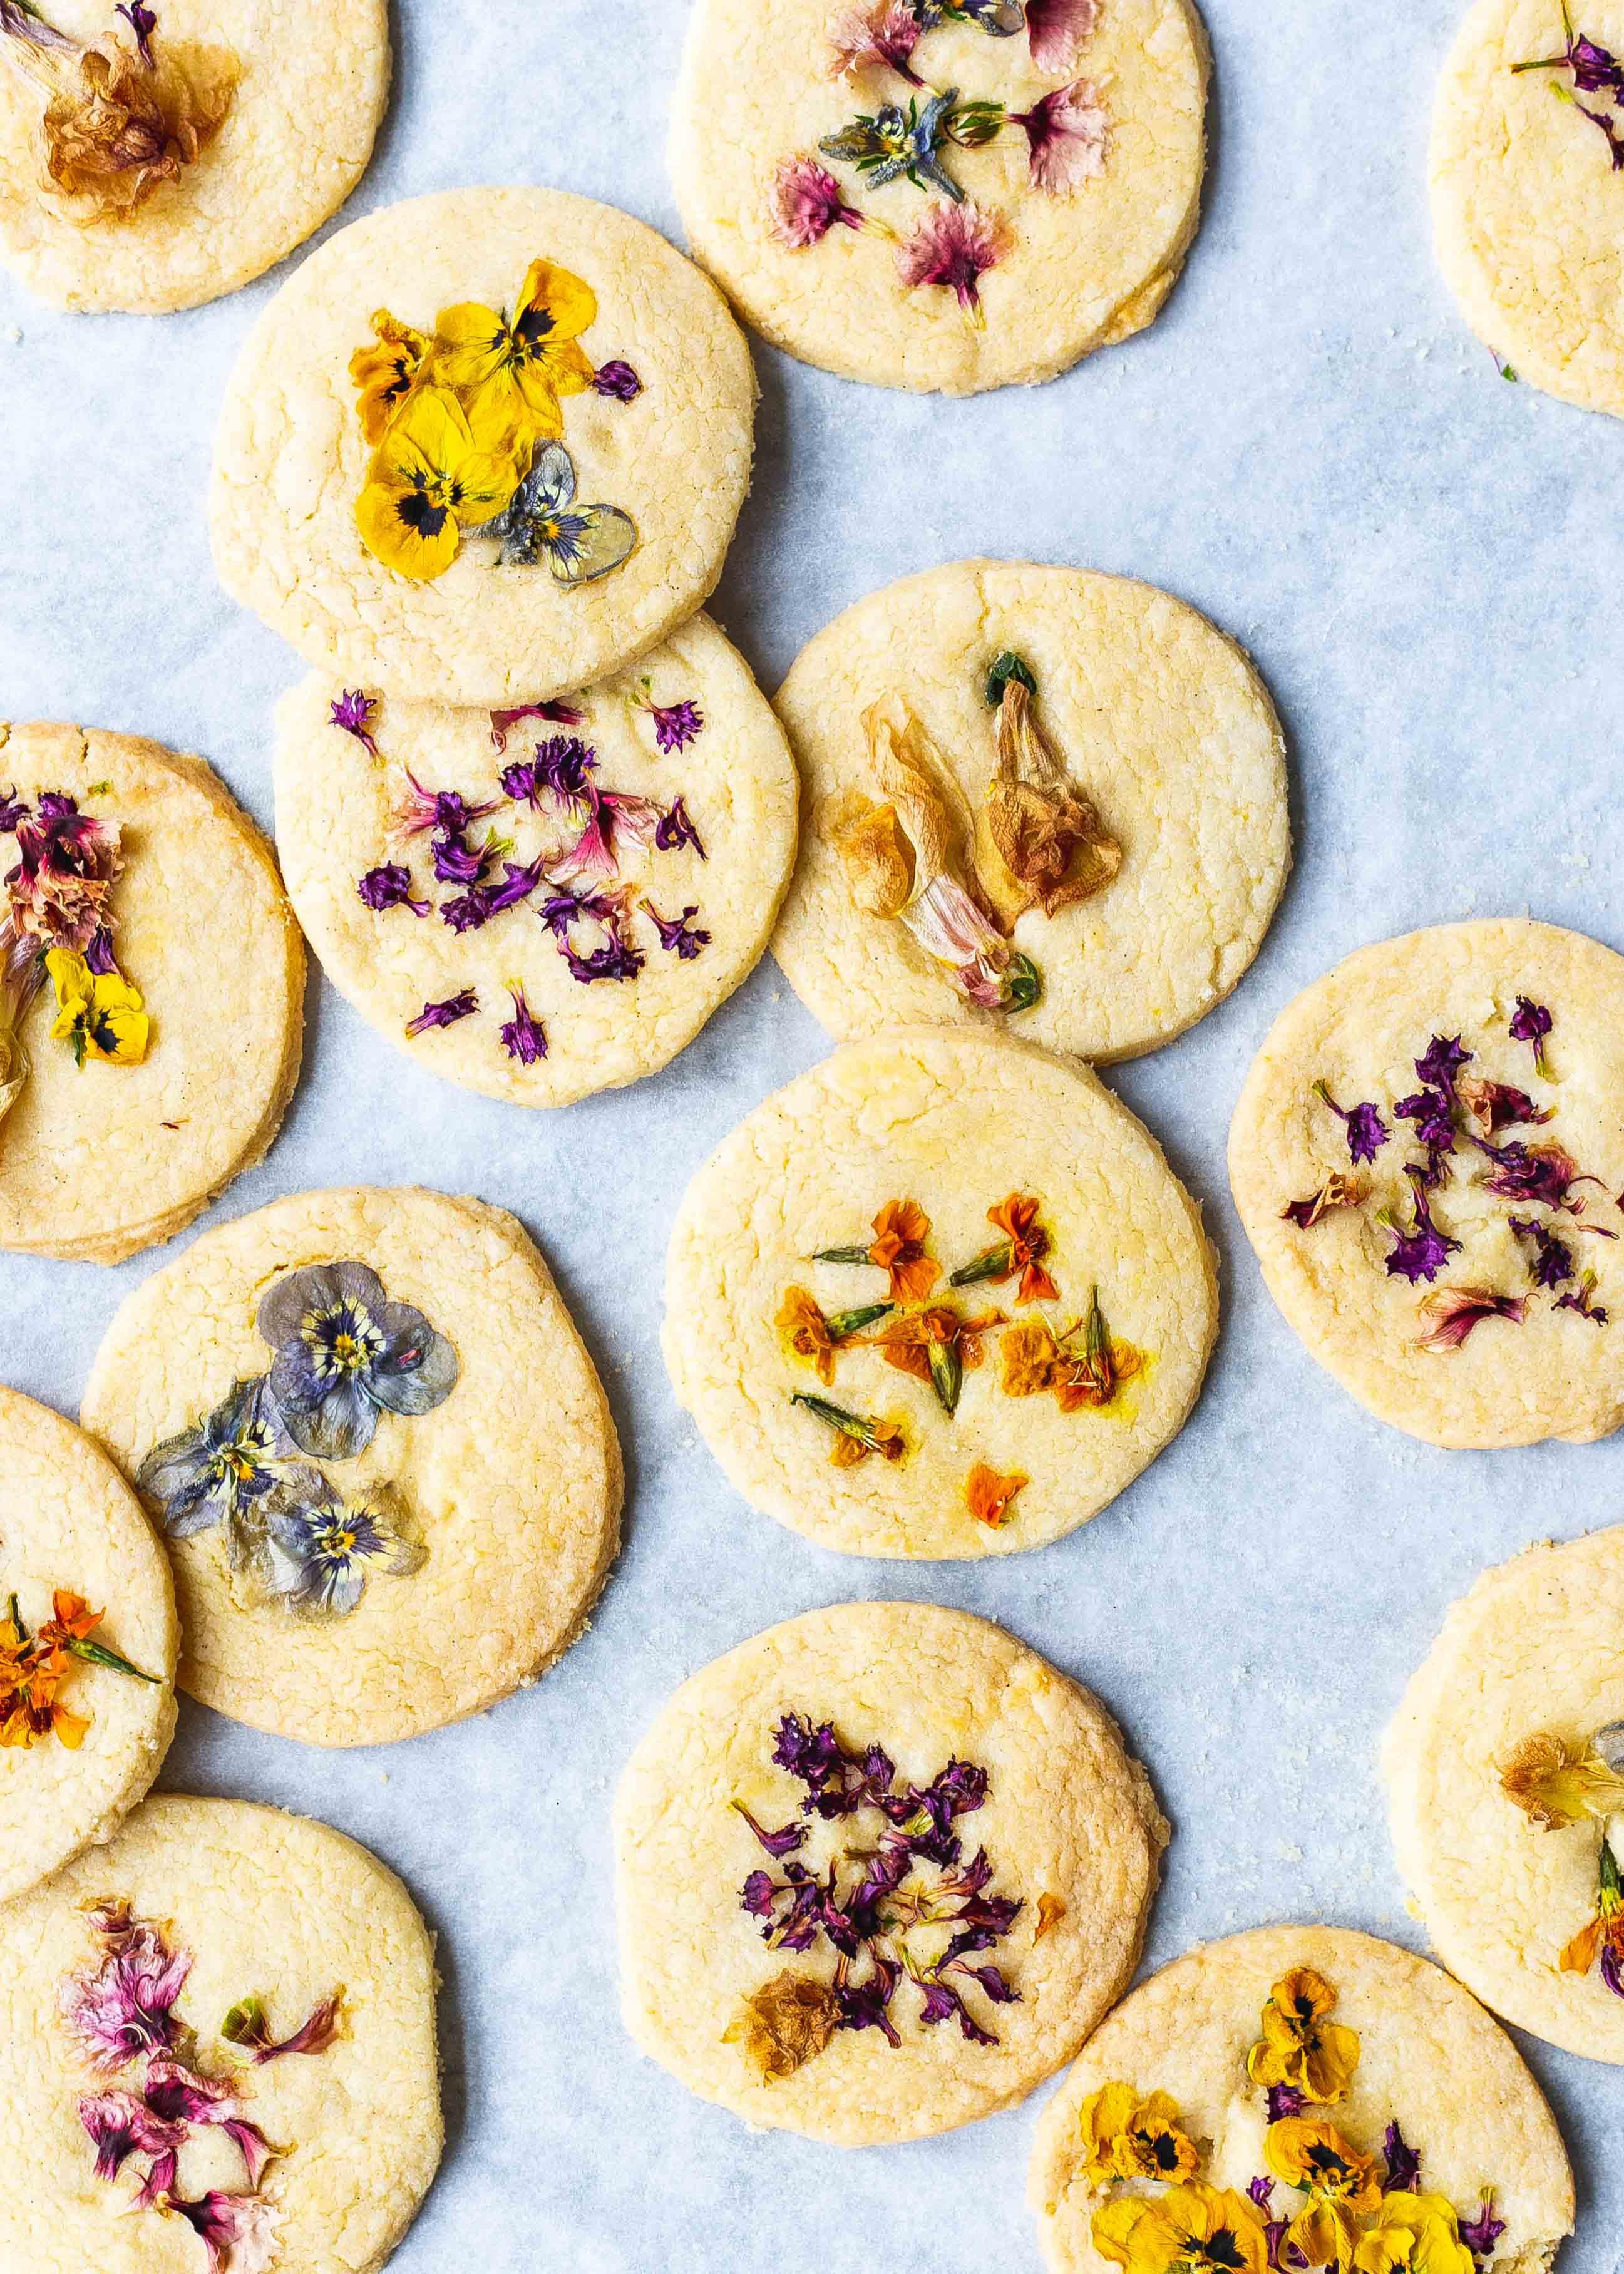 Low FODMAP shortbread cookies with edible flowers